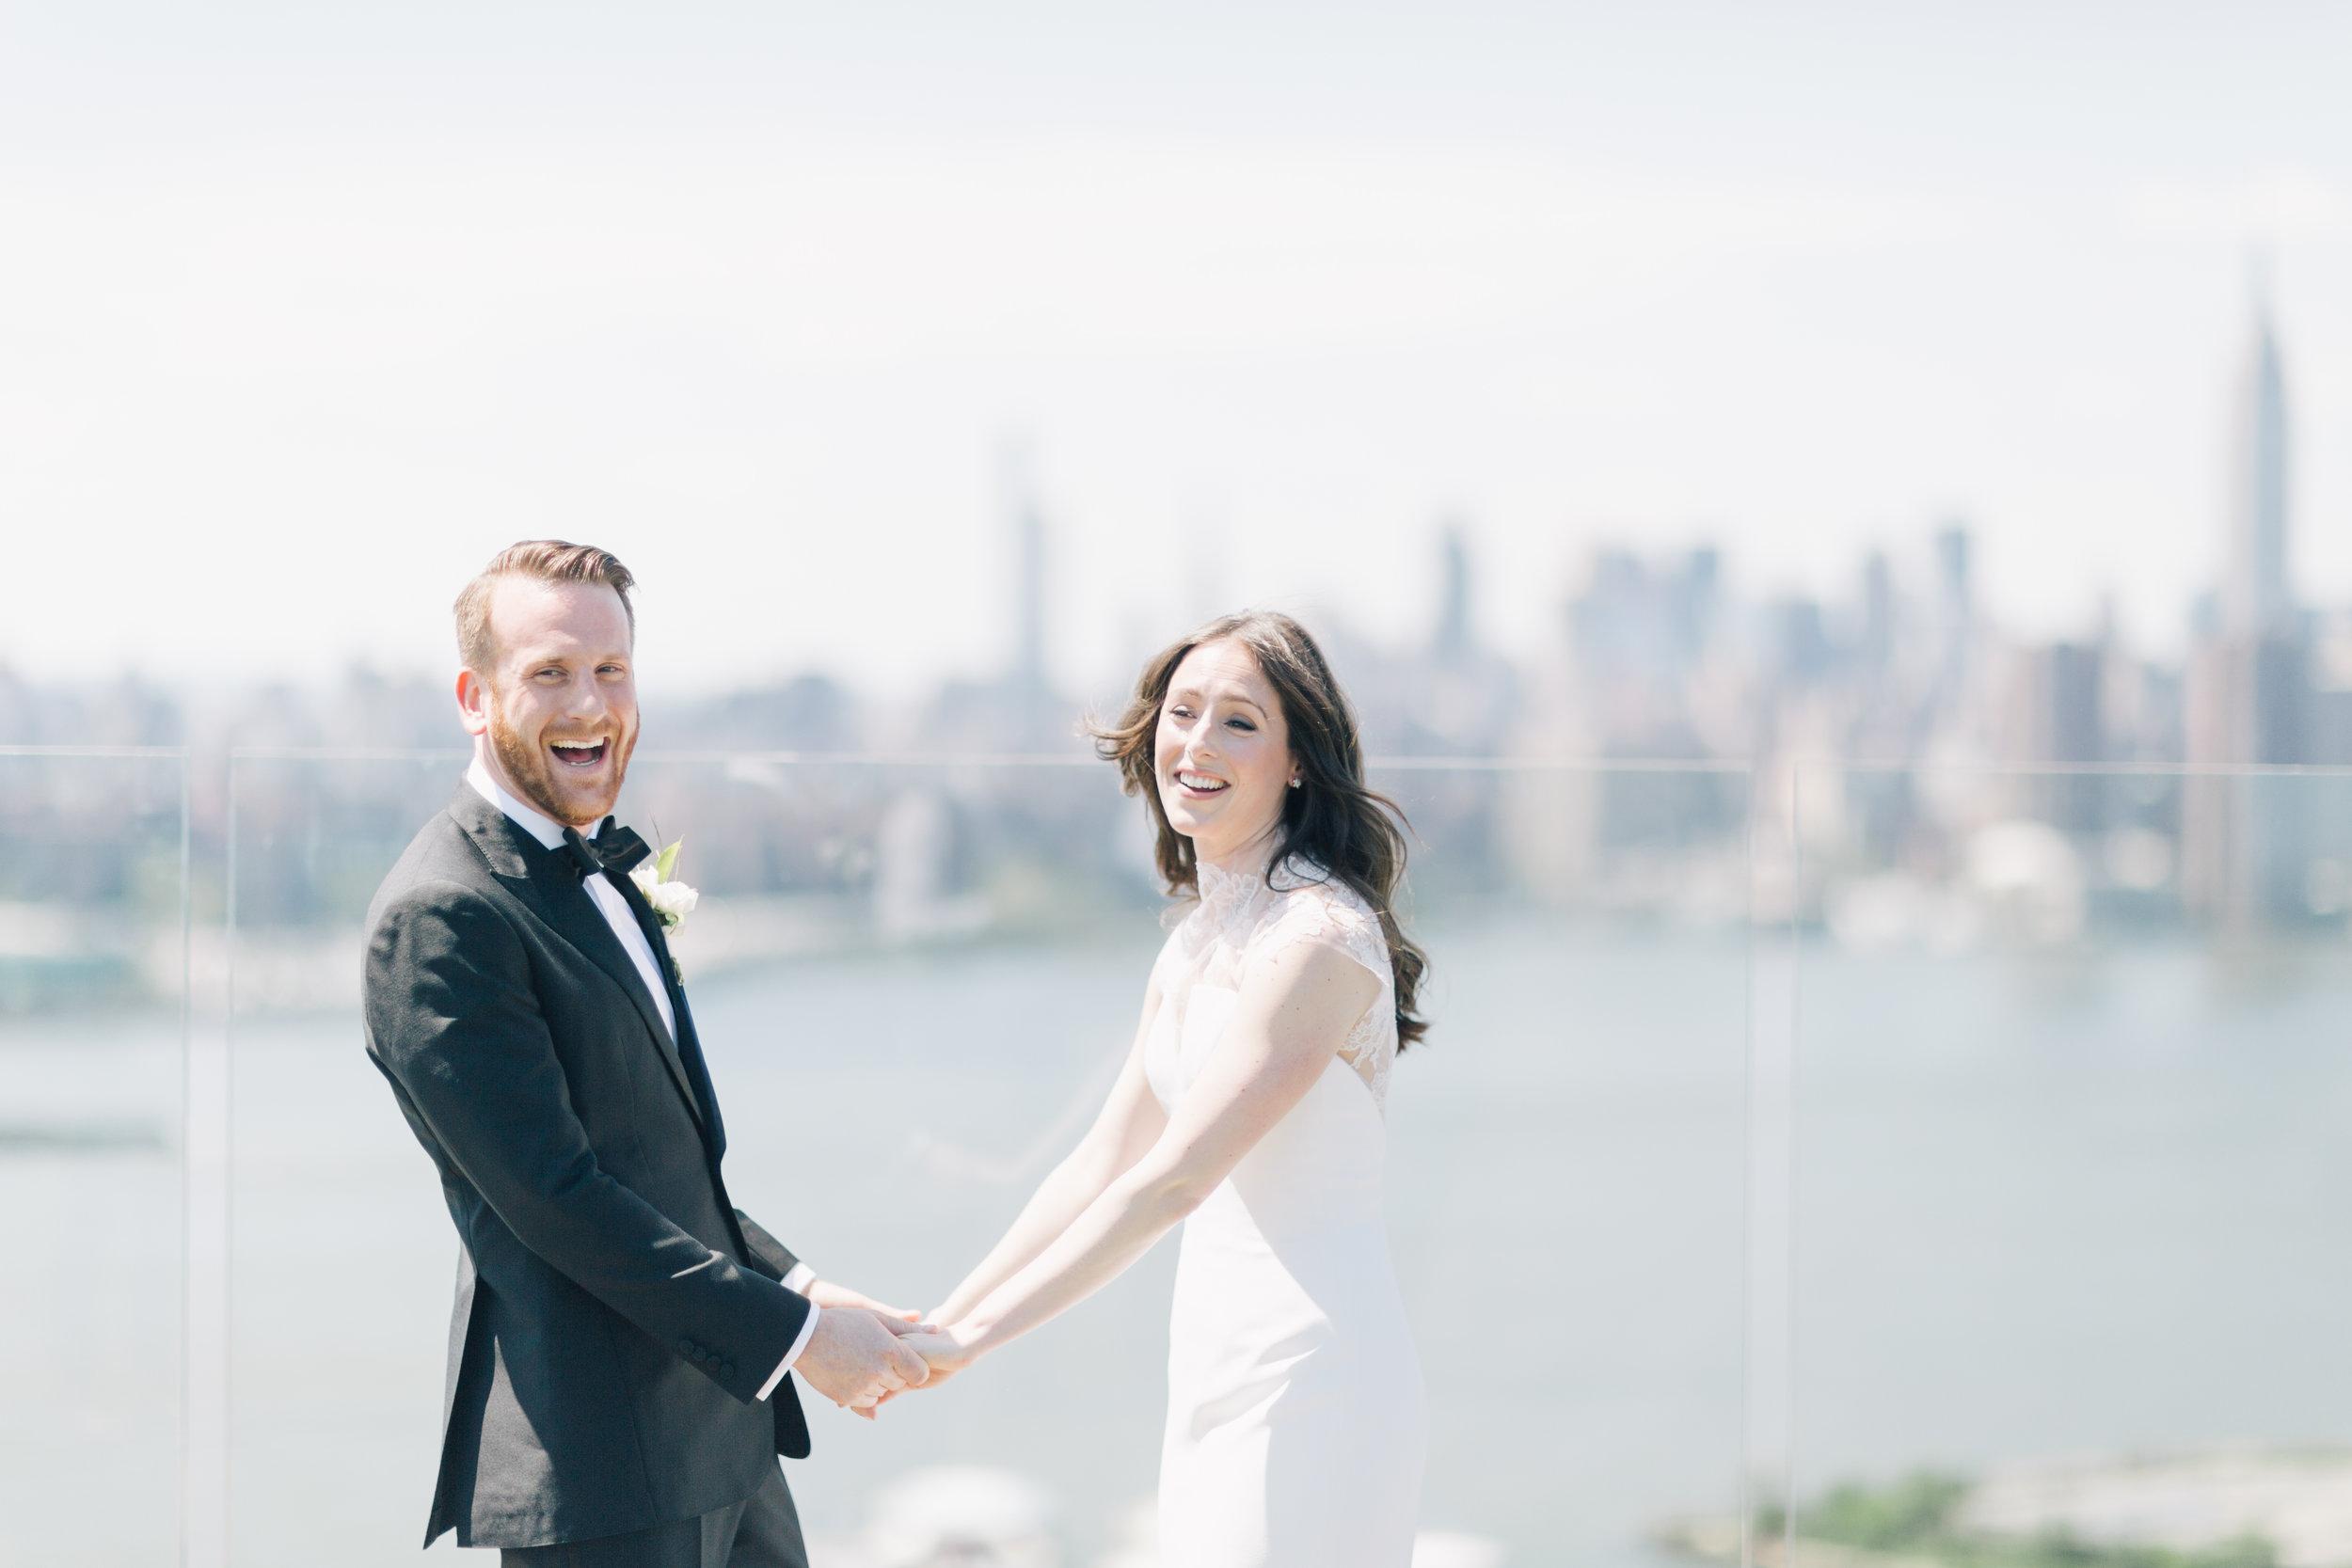 William Vale Wedding - Samantha + Brett 209.JPG